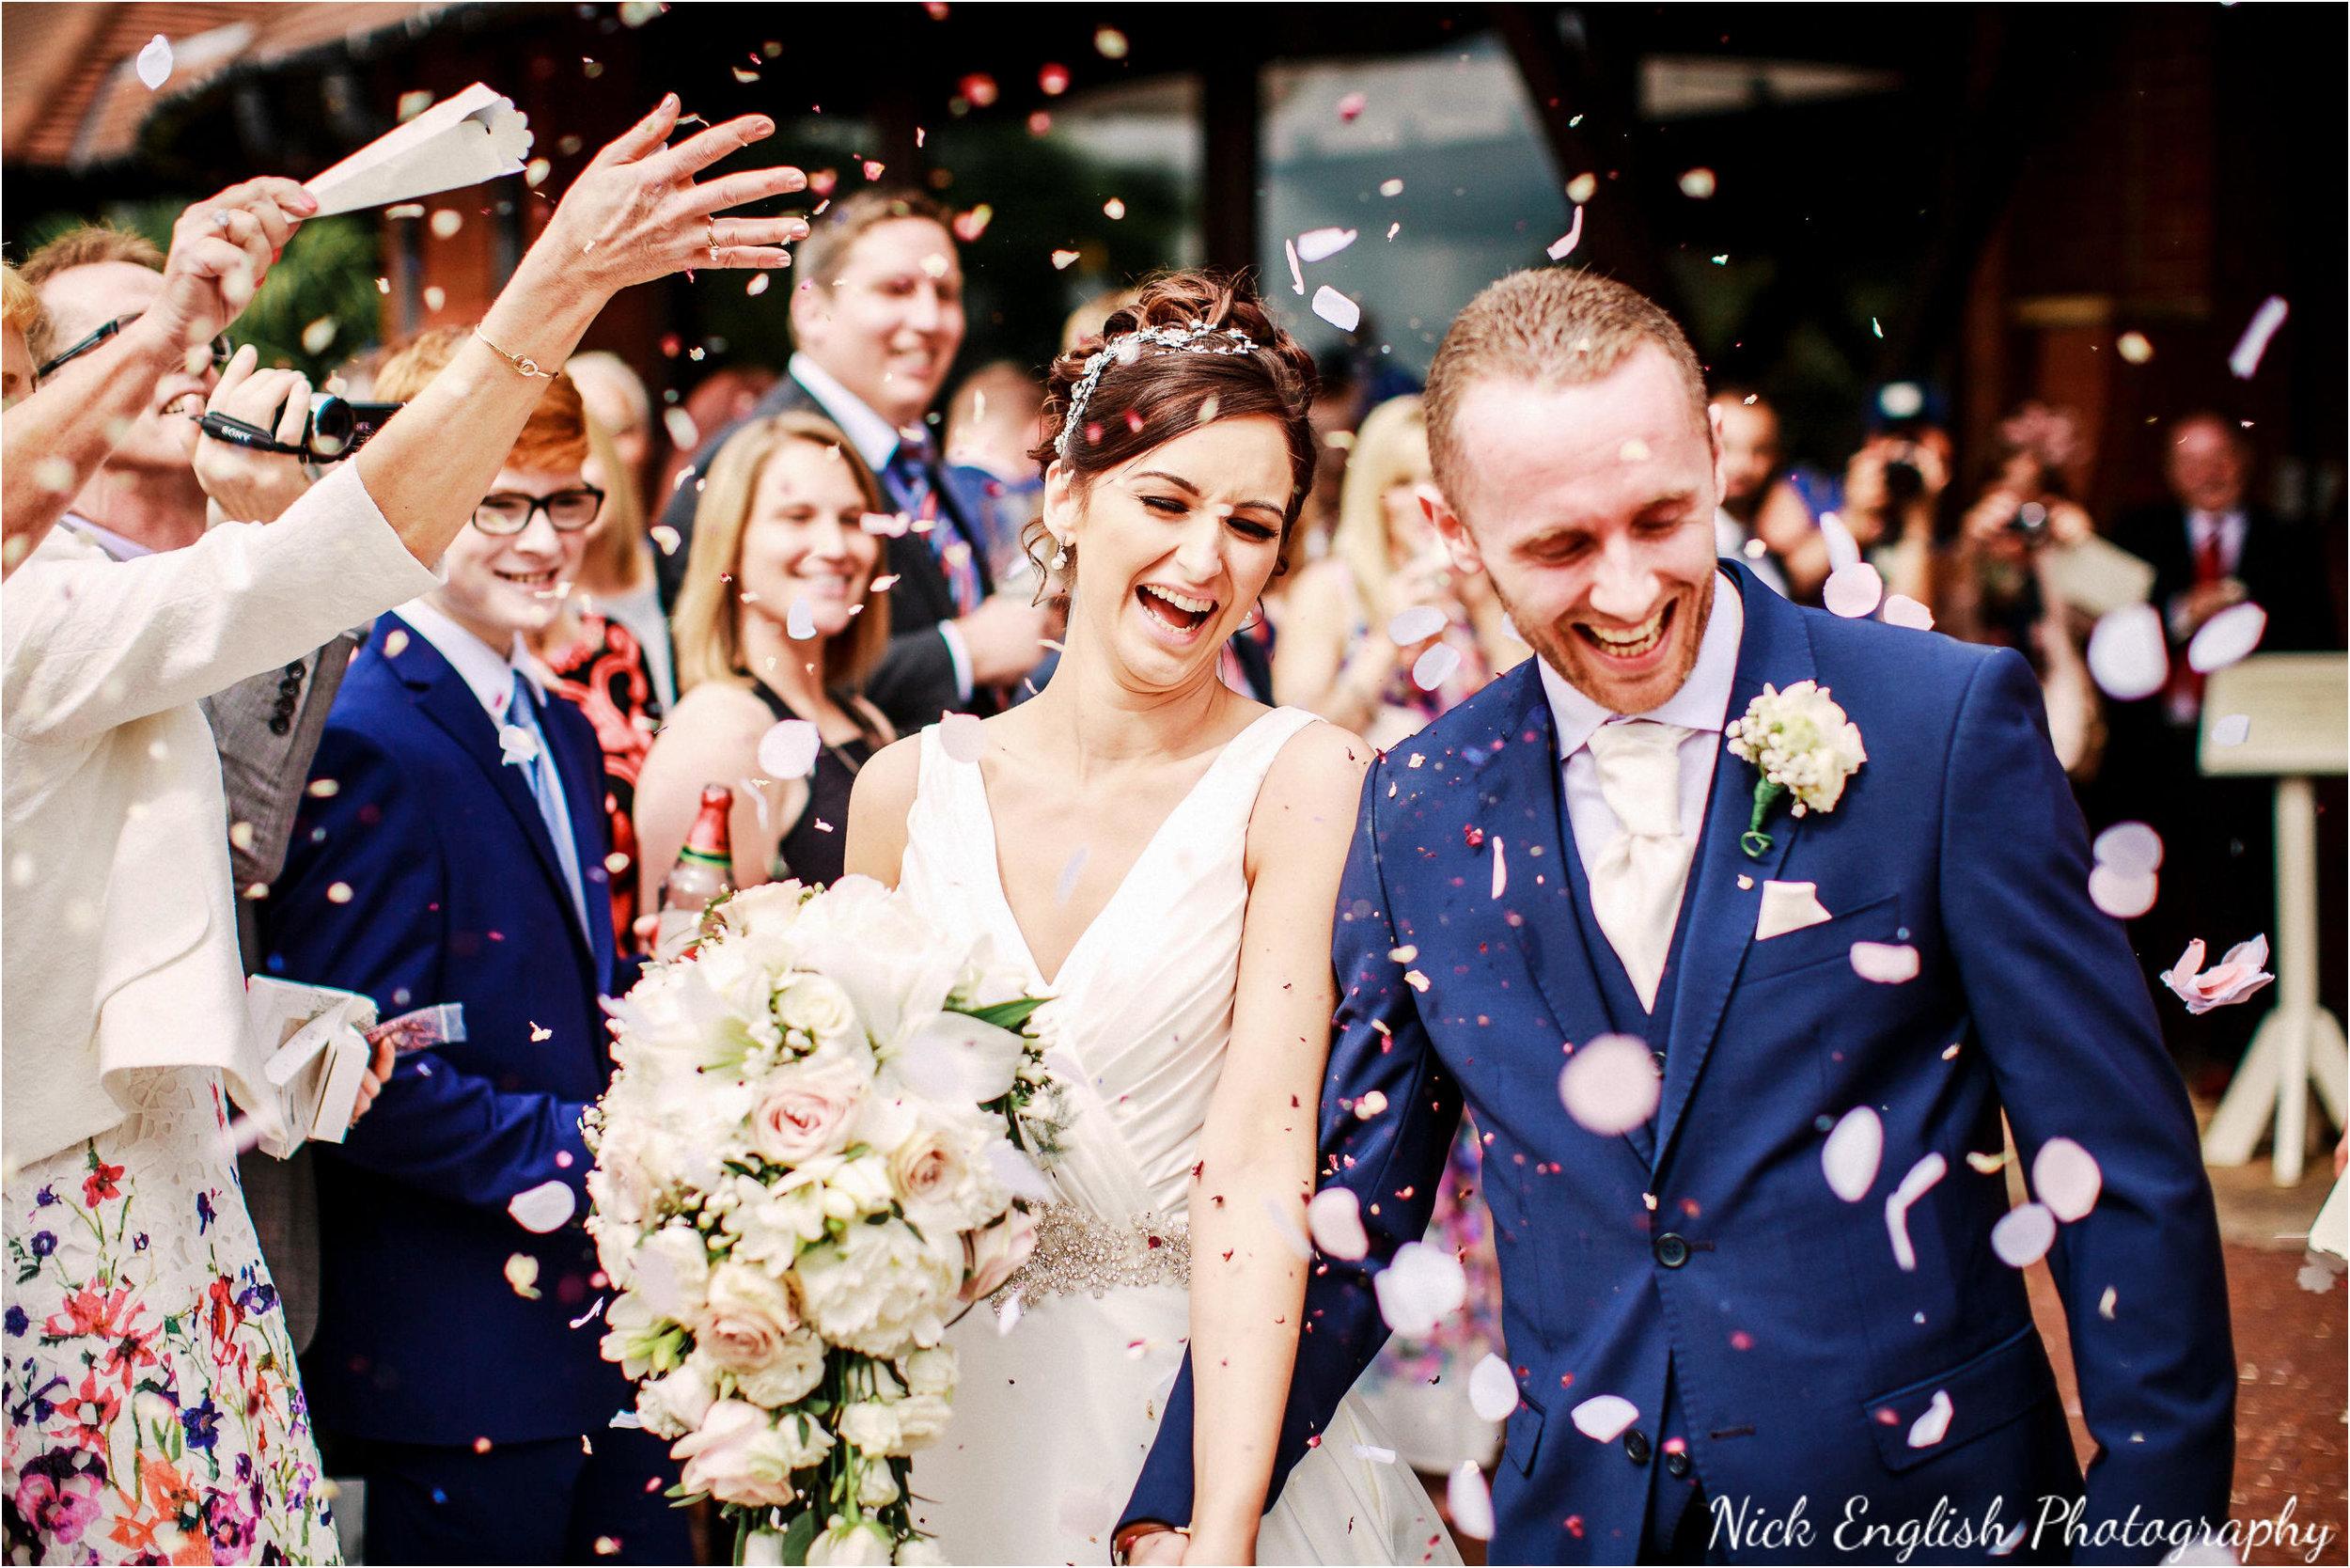 Emily David Wedding Photographs at Barton Grange Preston by Nick English Photography 154jpg.jpeg